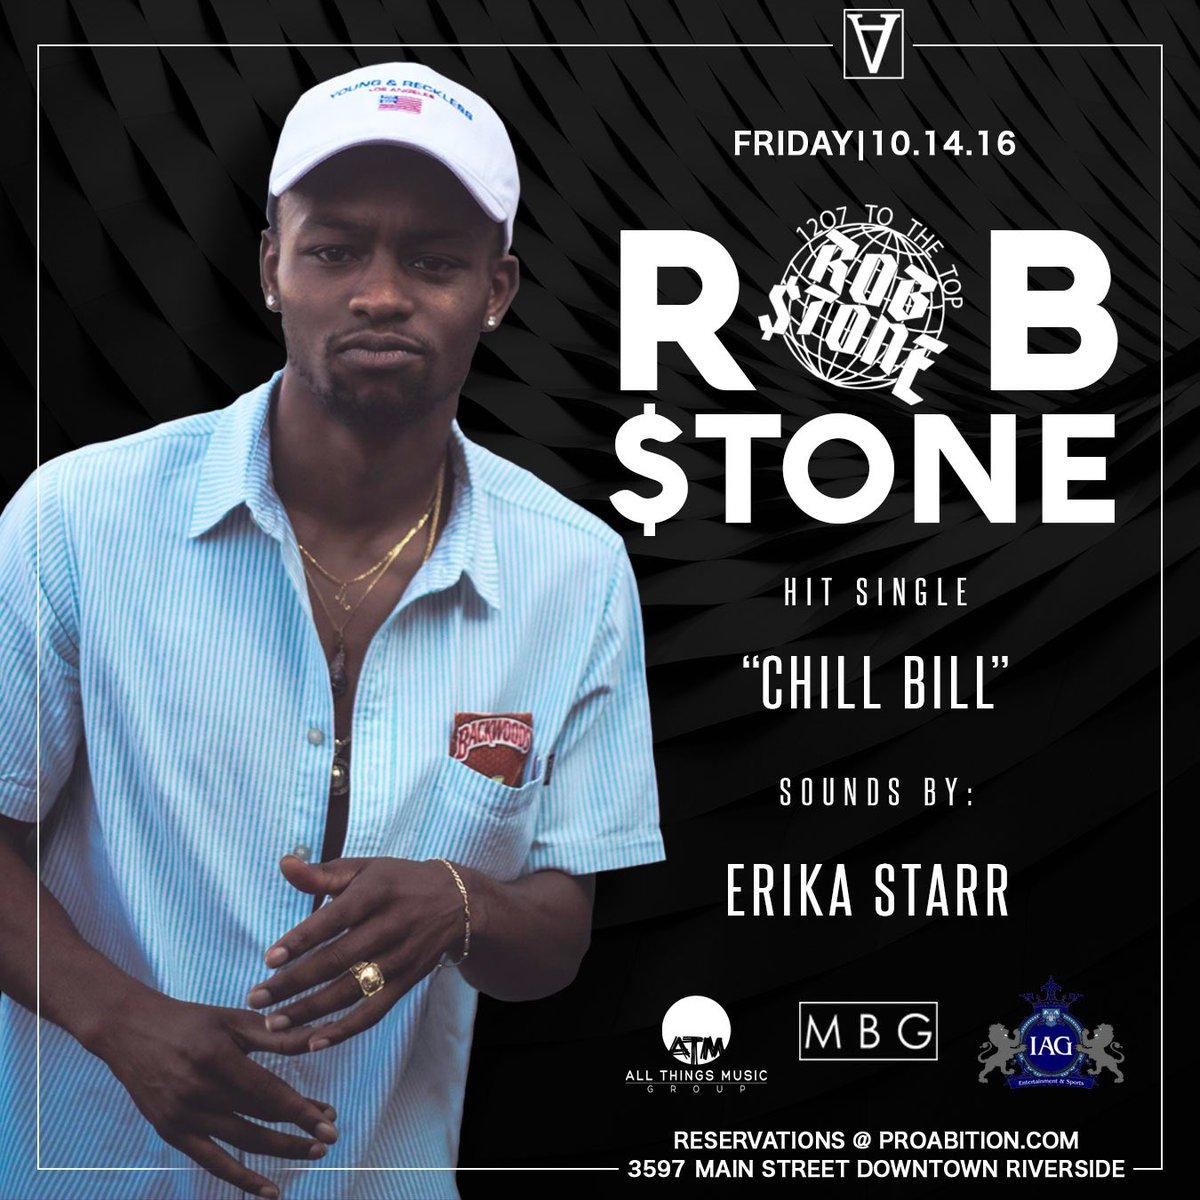 This Friday @youngrobstone makes his #Riverside debut #ChillBill #IAG https://t.co/k6xfb2LShA